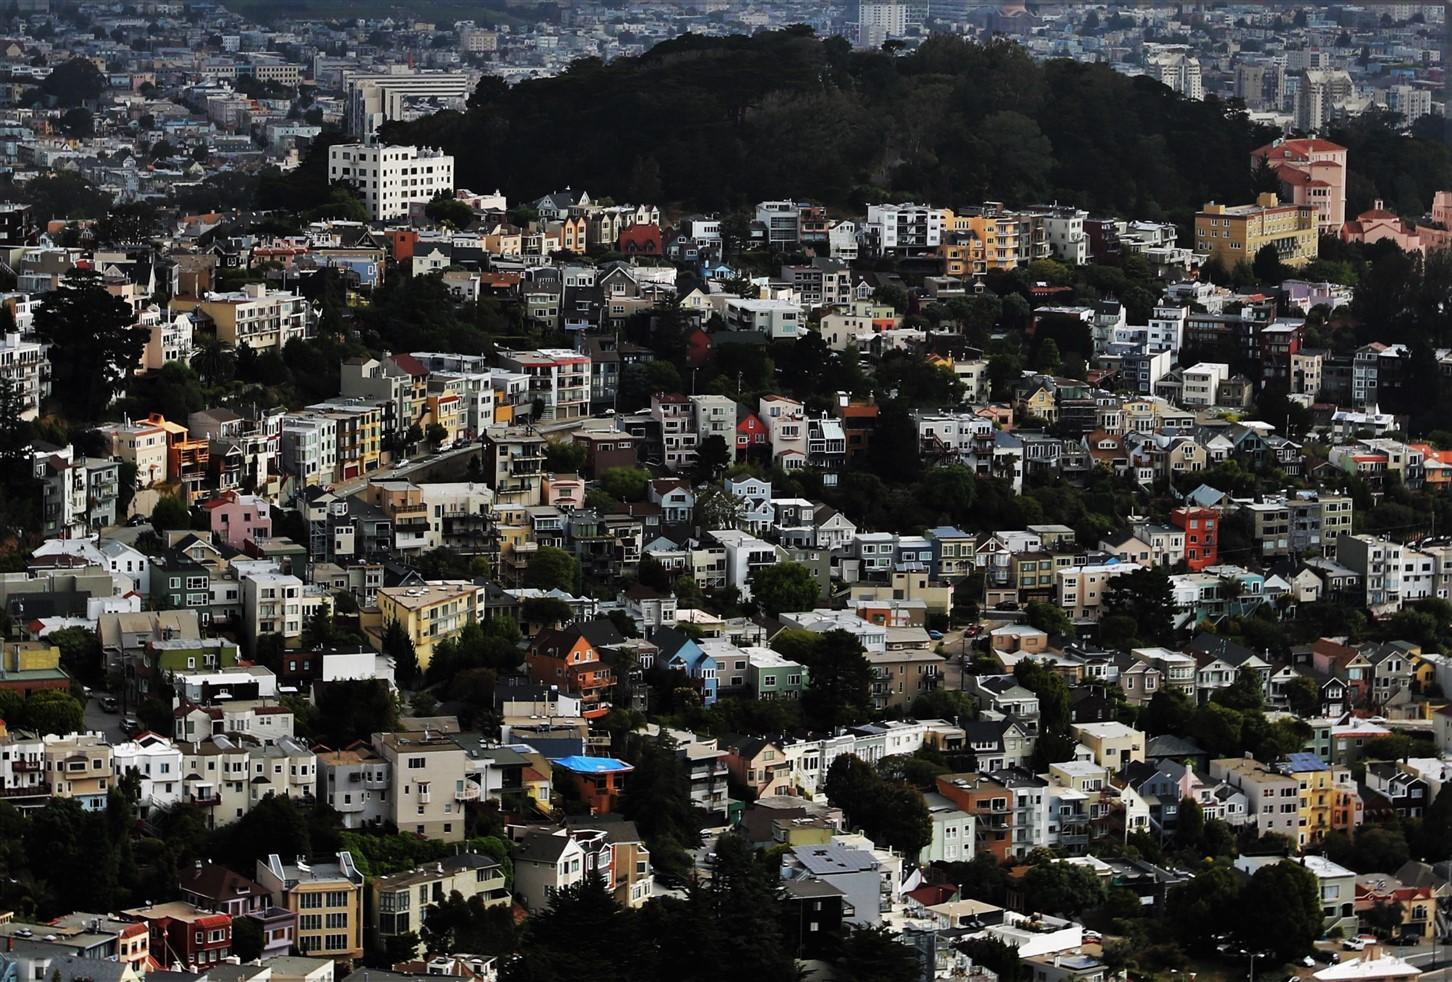 2016 05 21 20 San Francisco.jpg